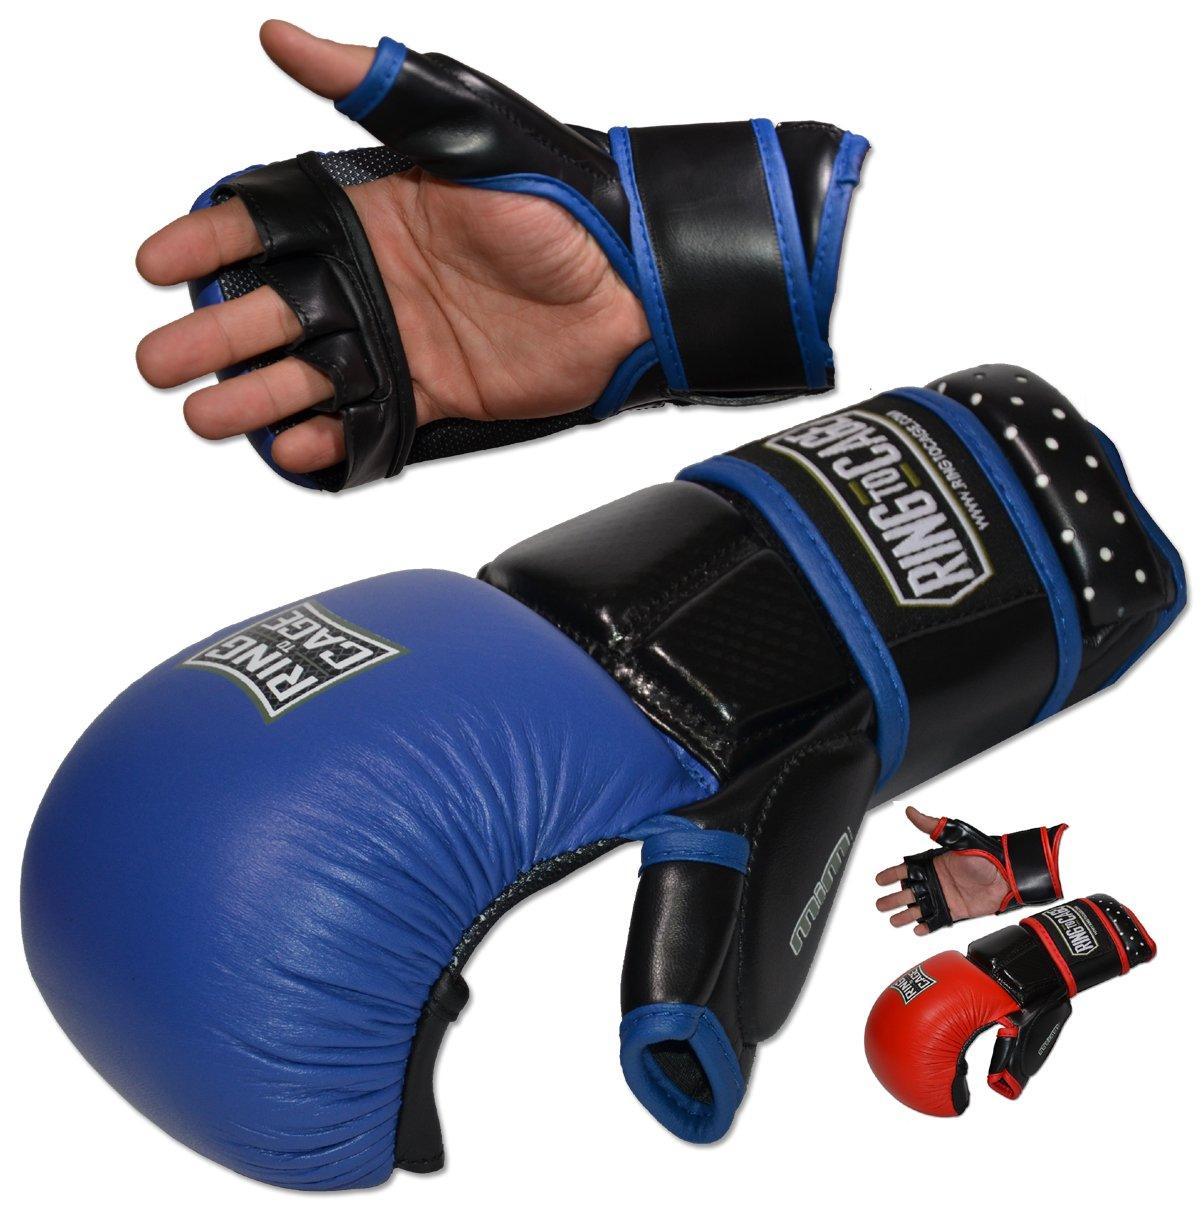 Ultima mim-foam MMA安全スパーリンググローブ B073NWSFXS ブルー Large